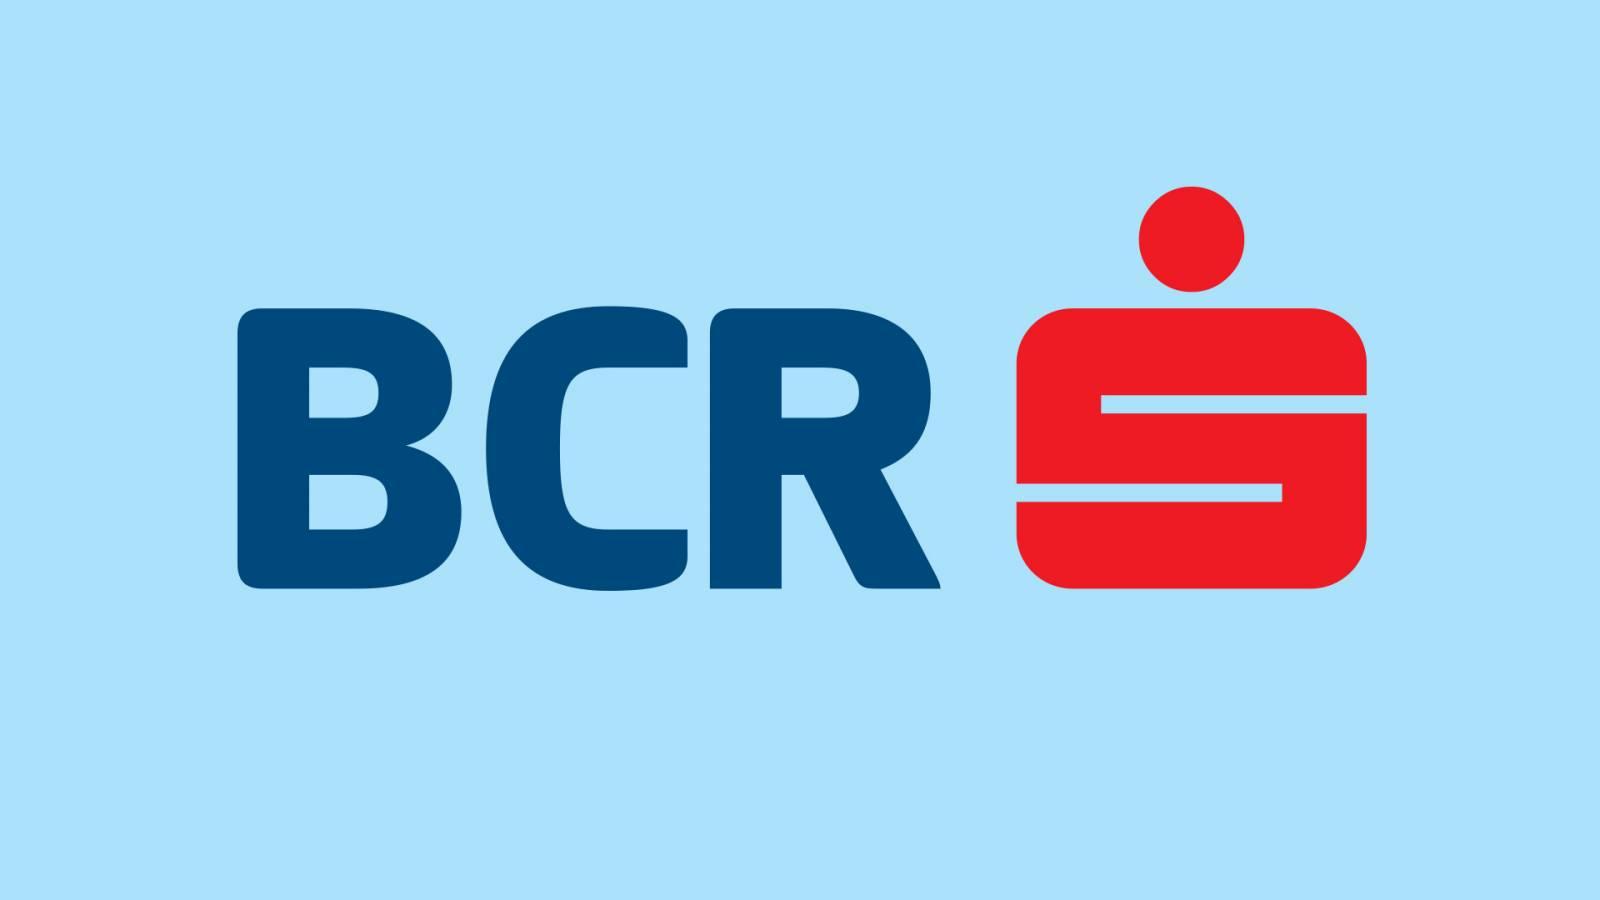 BCR Romania stradal